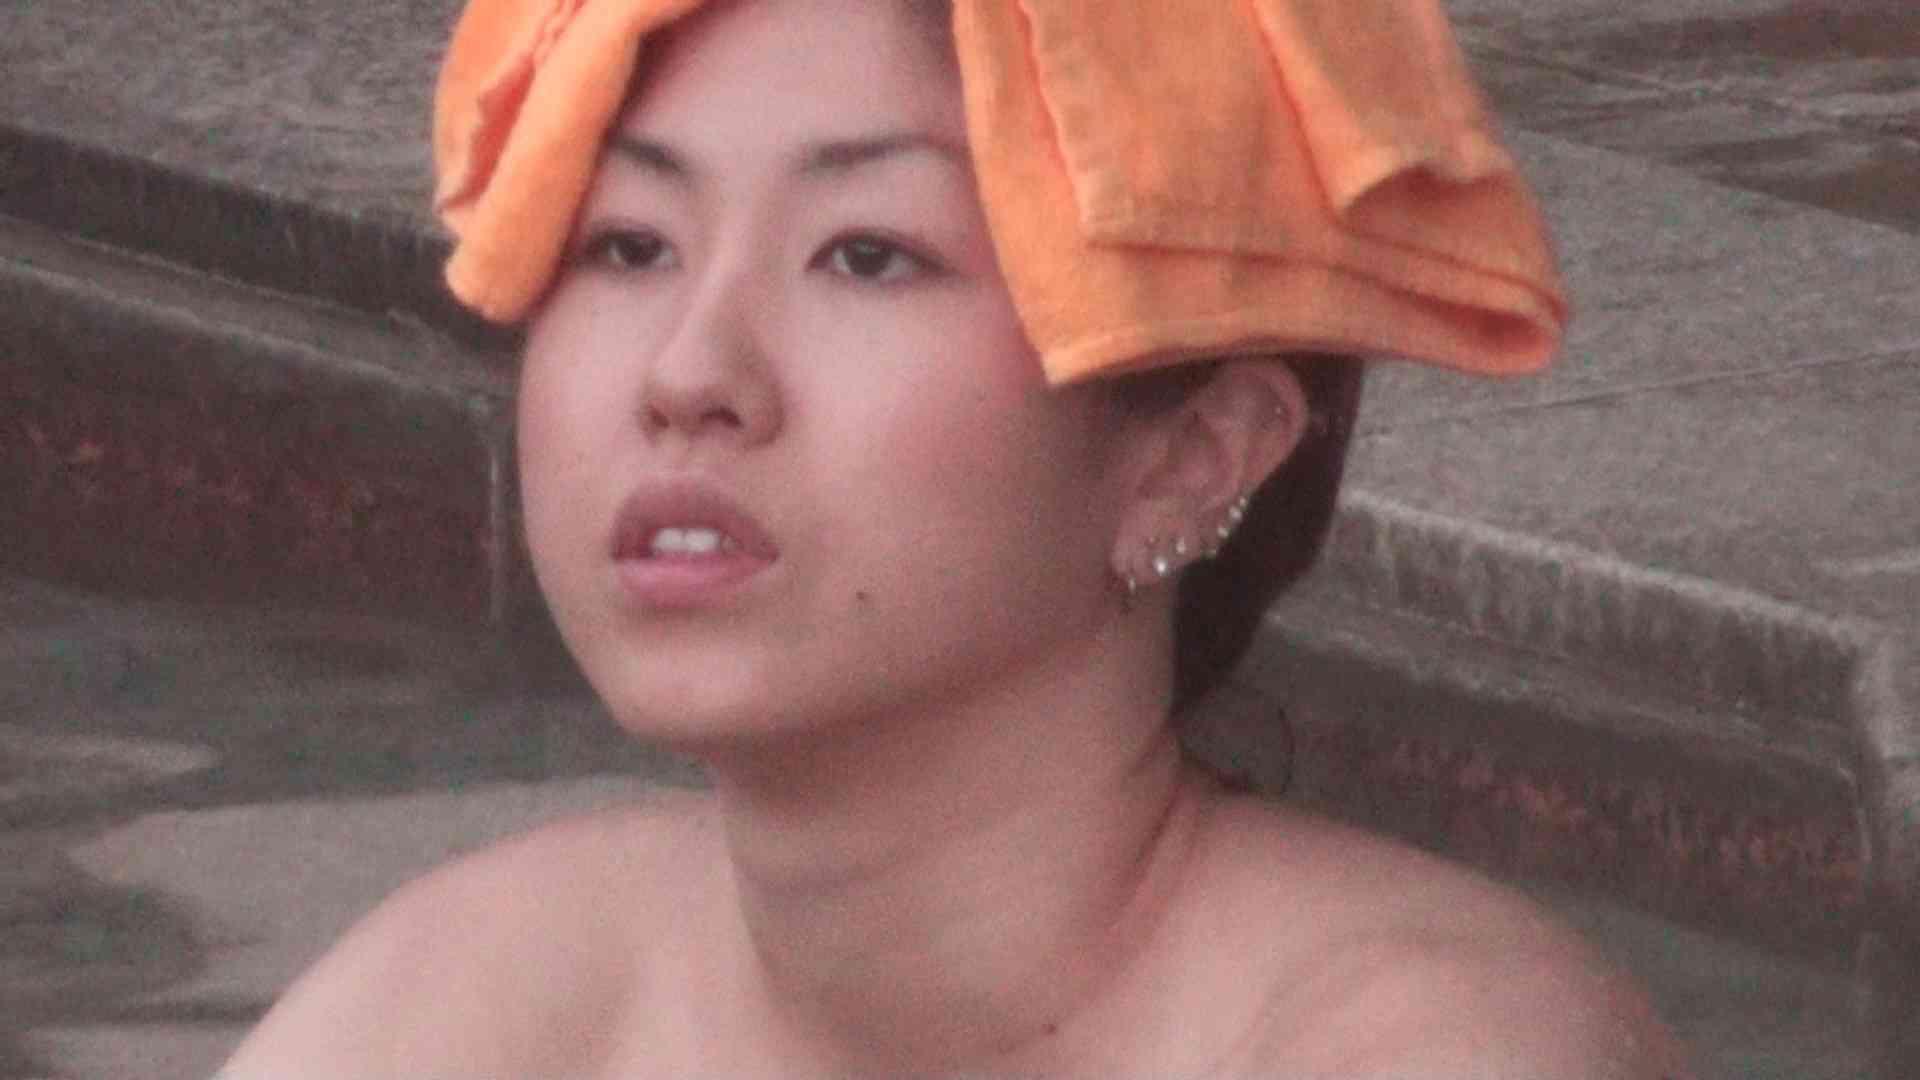 Aquaな露天風呂Vol.135 盗撮師作品 | 露天風呂突入  105pic 16